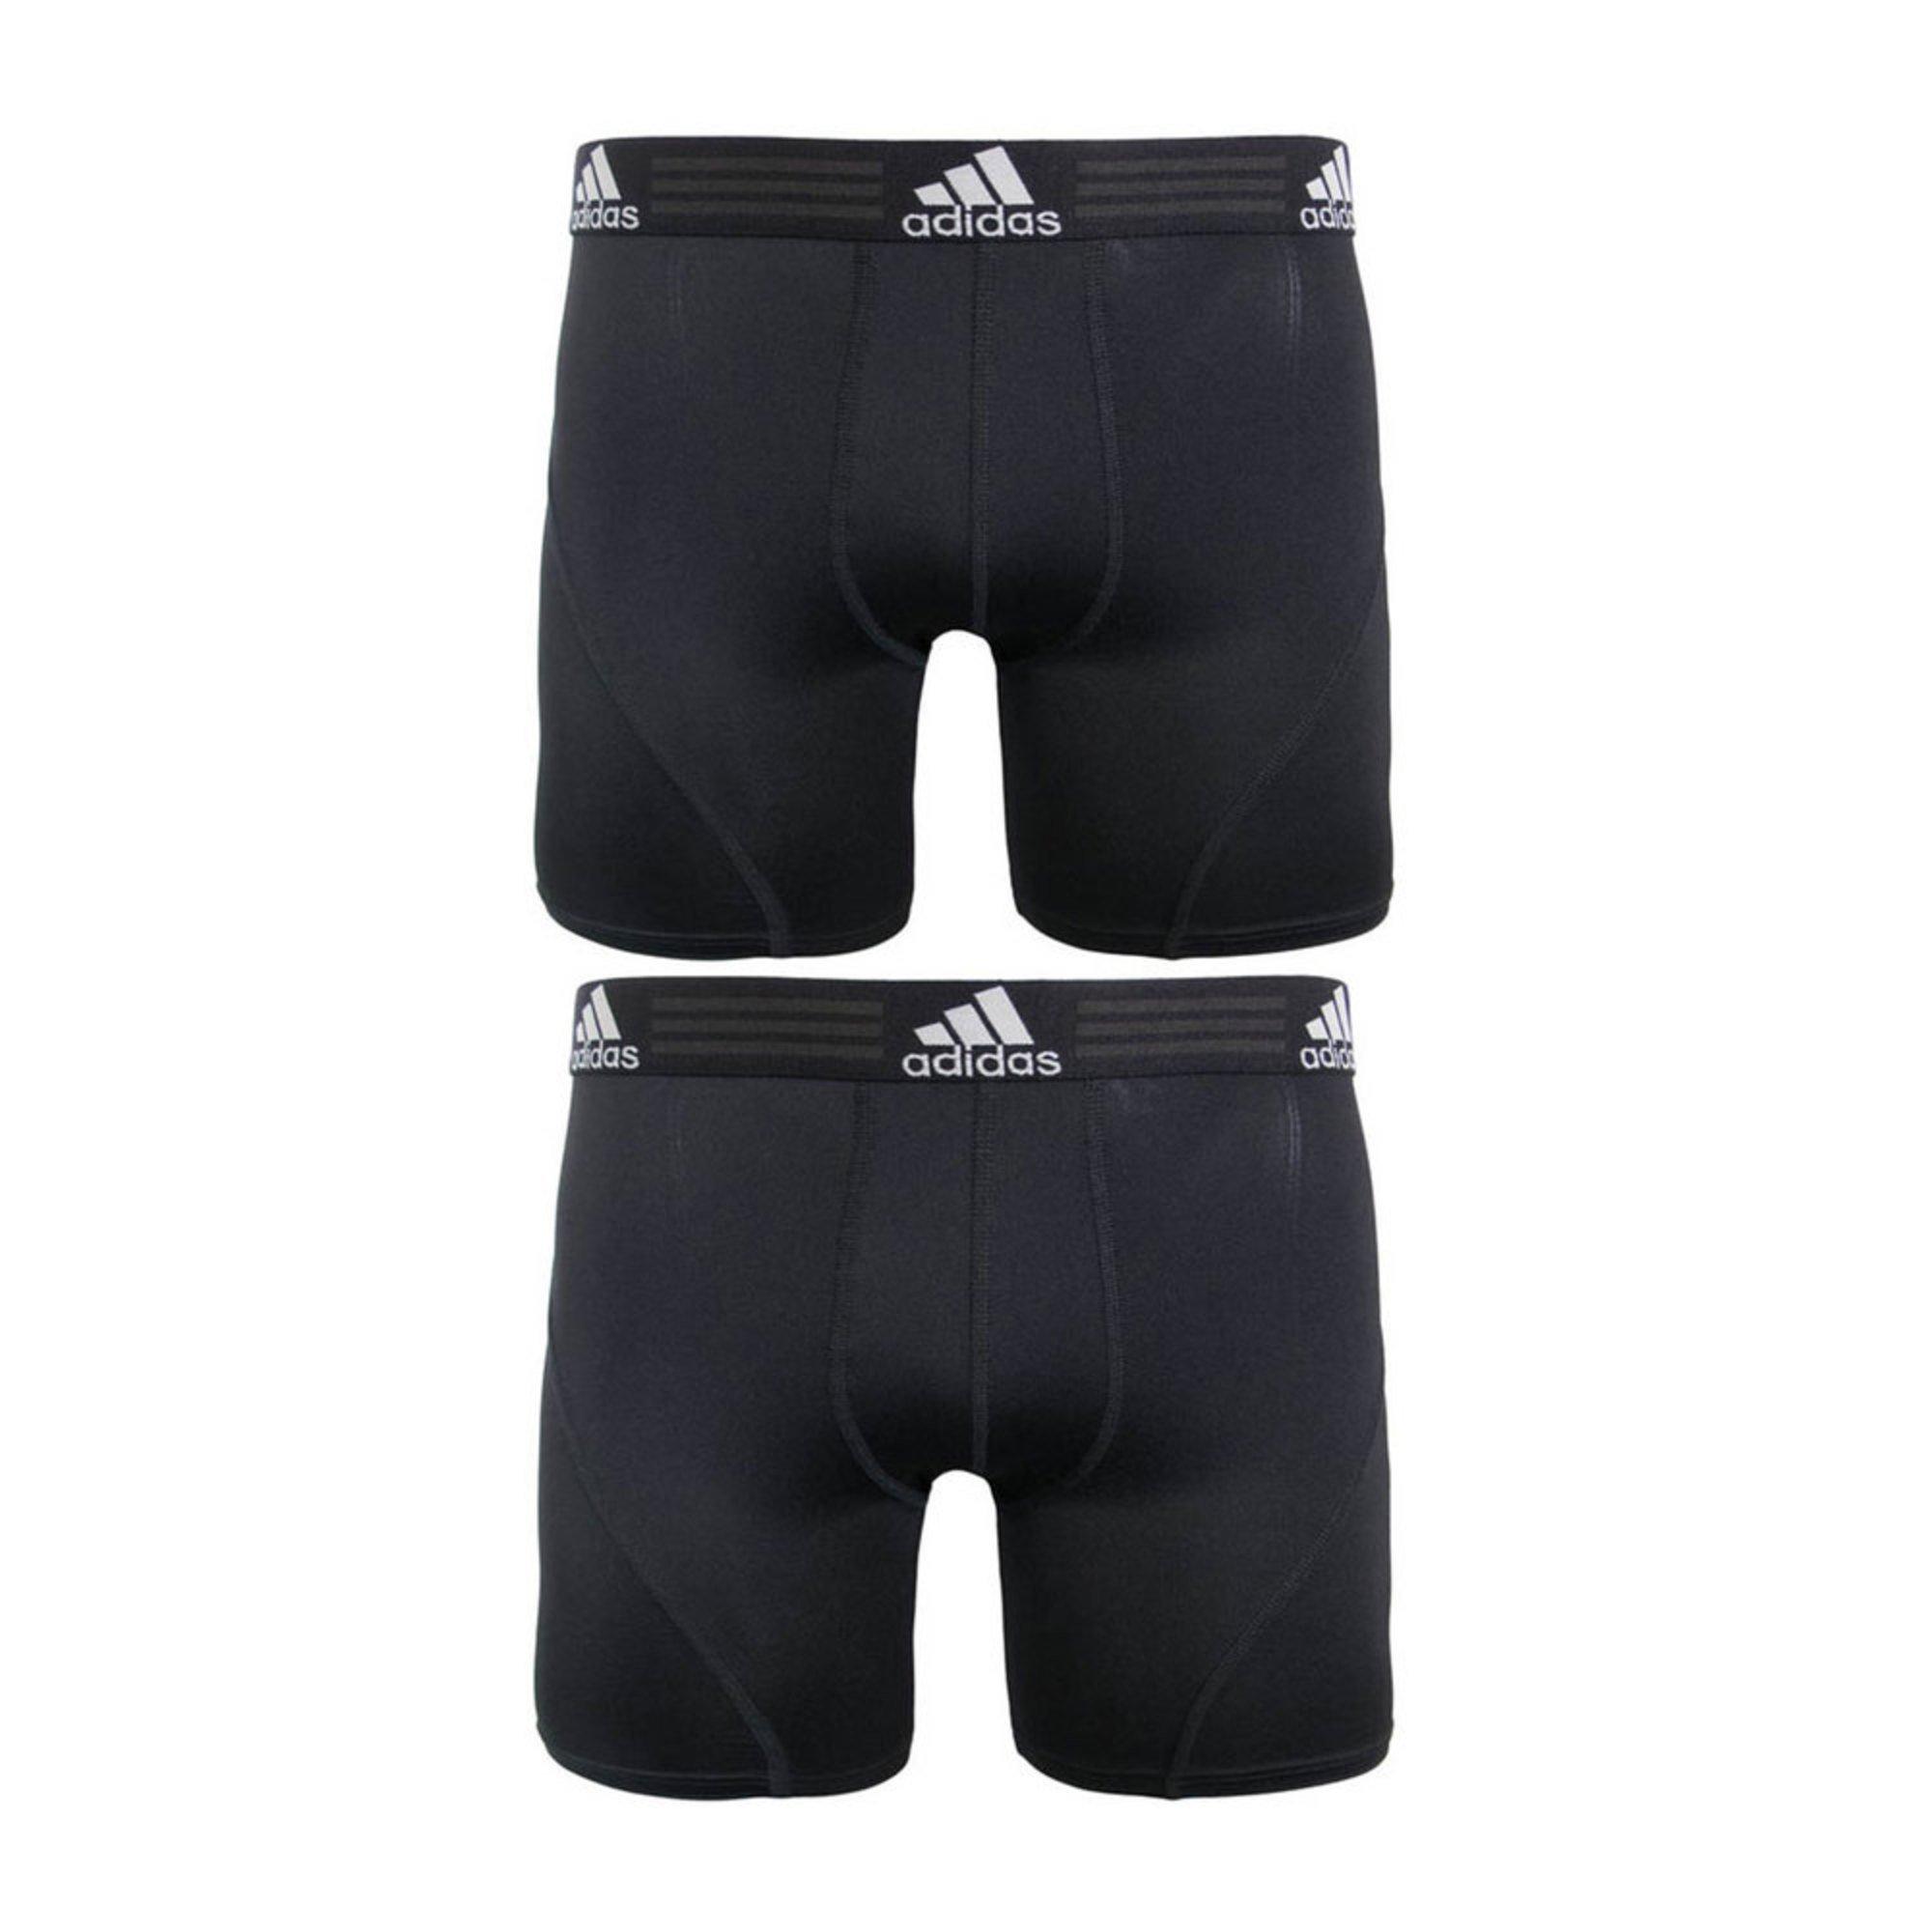 877562706d47 Adidas Men s Performance Sport Climalite 2-pack Boxer Briefs